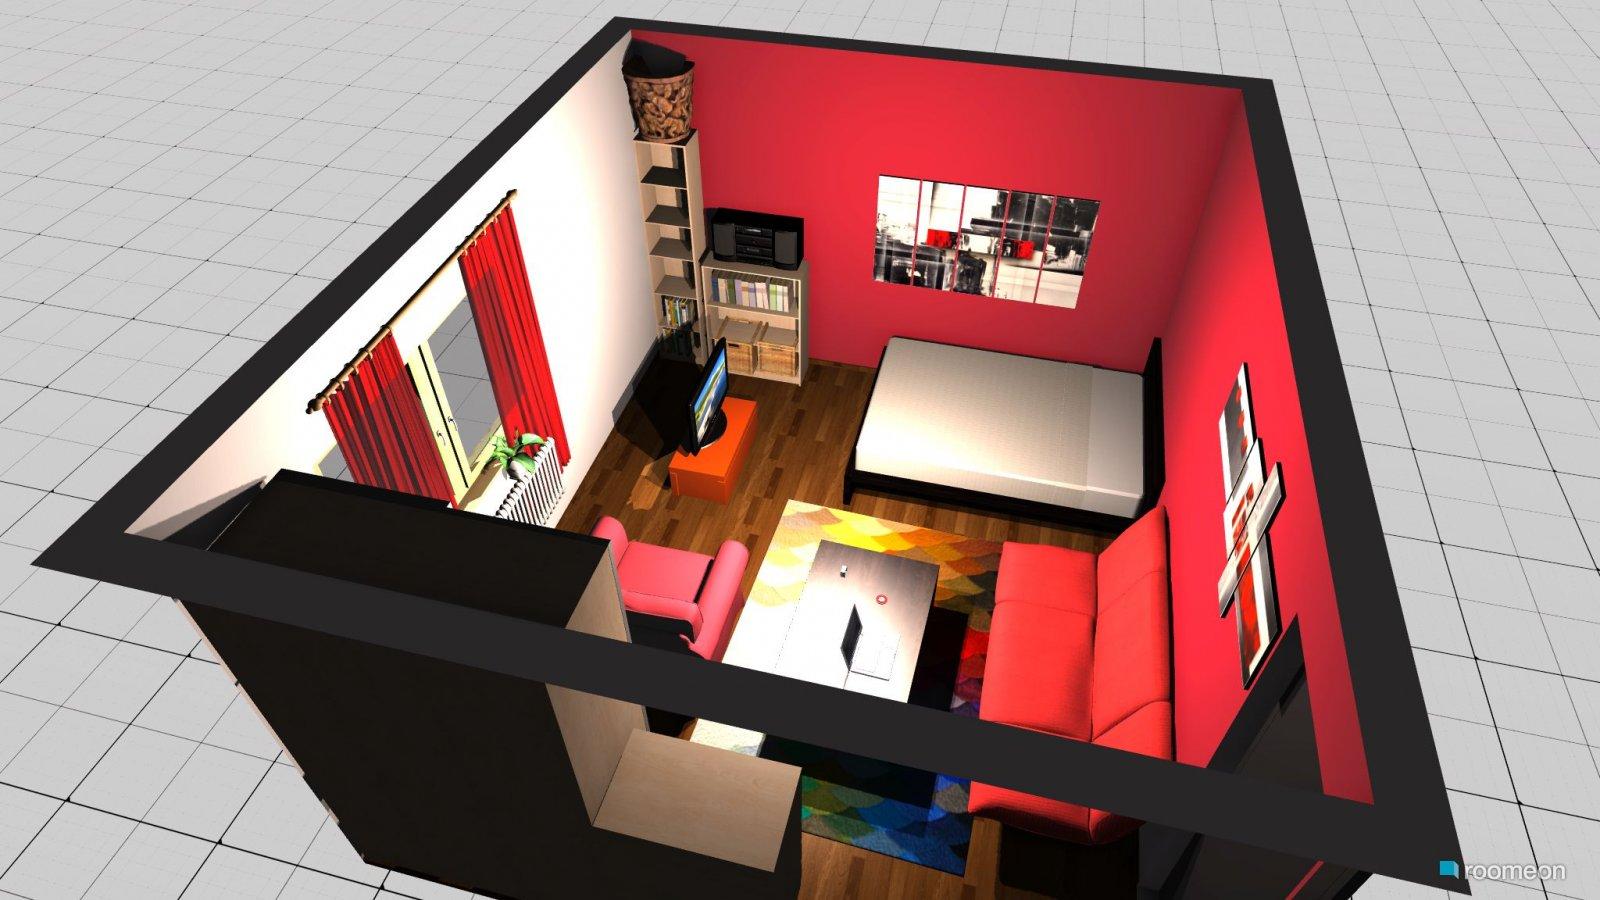 MALM Storage unit, orange - Design and Decorate Your Room in 3D